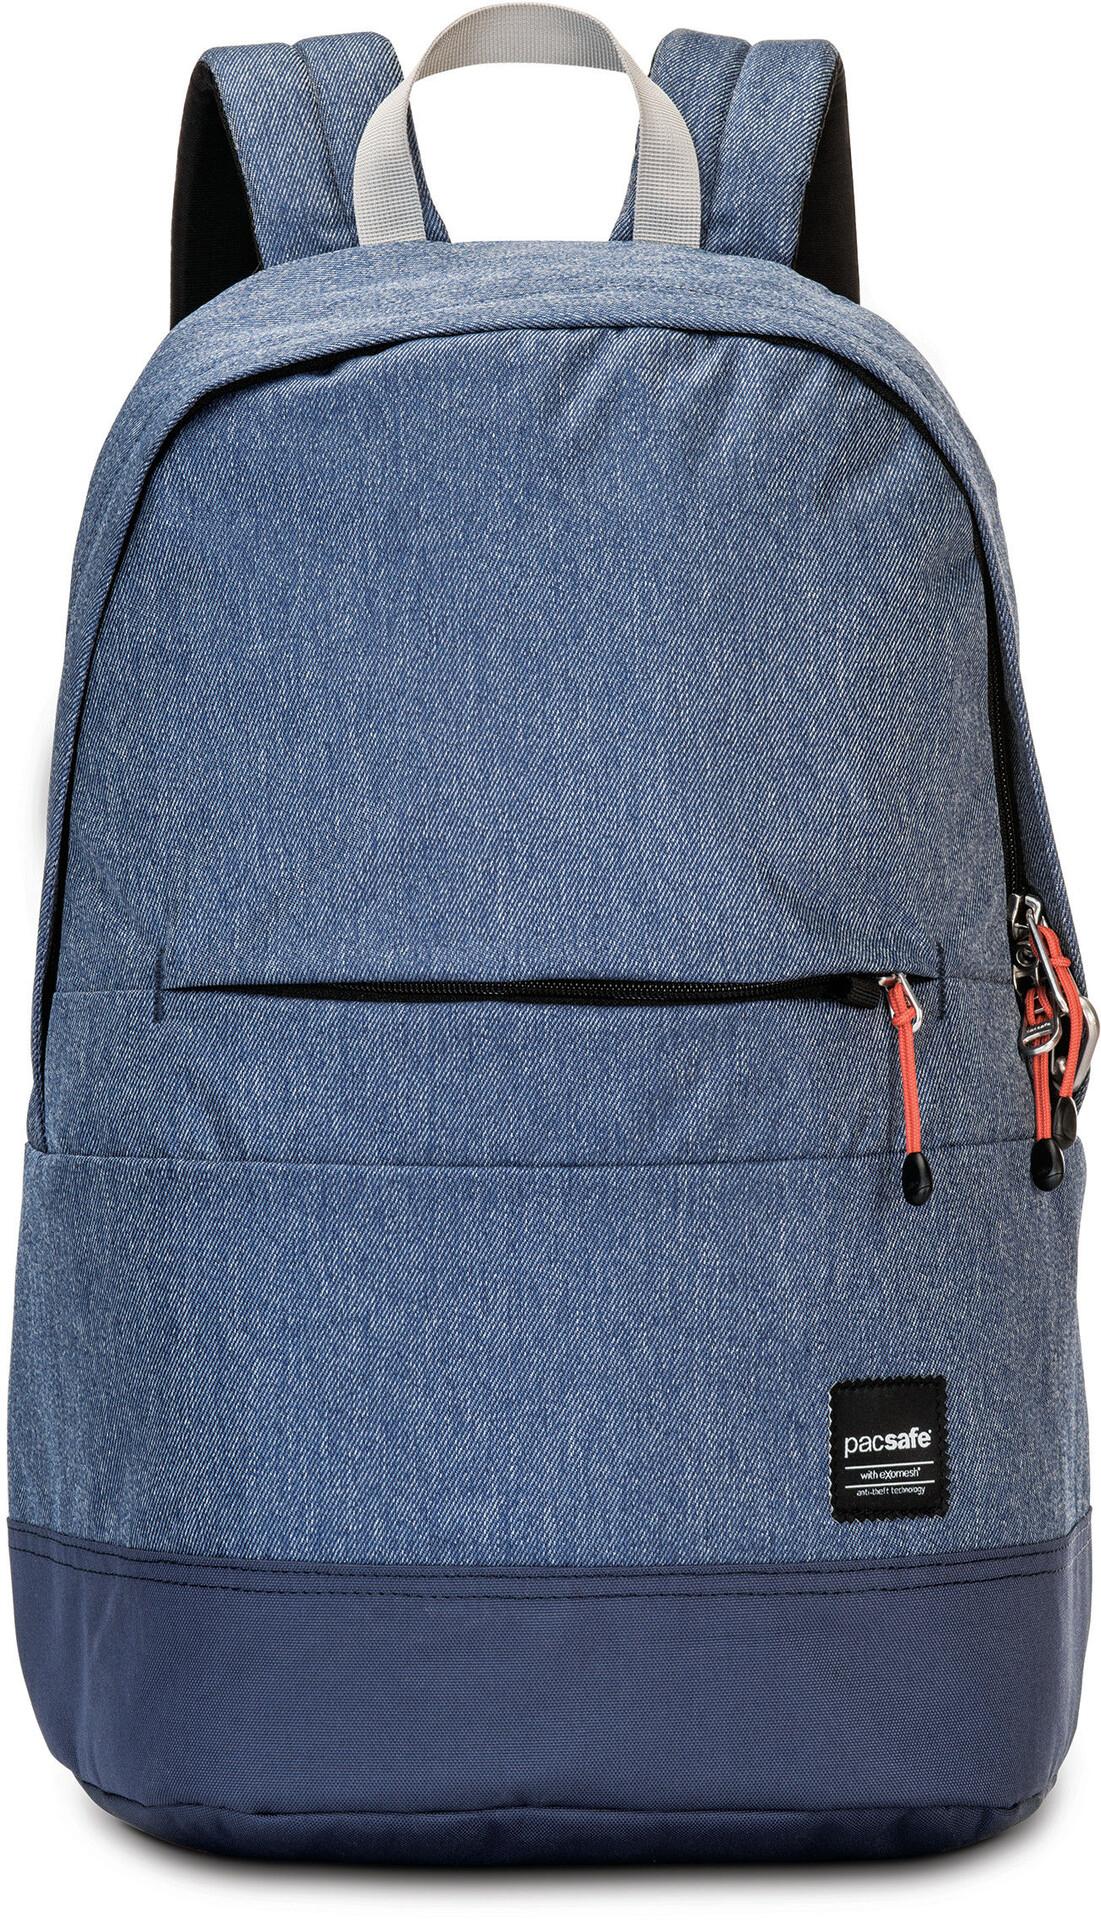 Bleu Sur Pacsafe À Dos Slingsafe Lx300 Sac Campz cqRjL35S4A